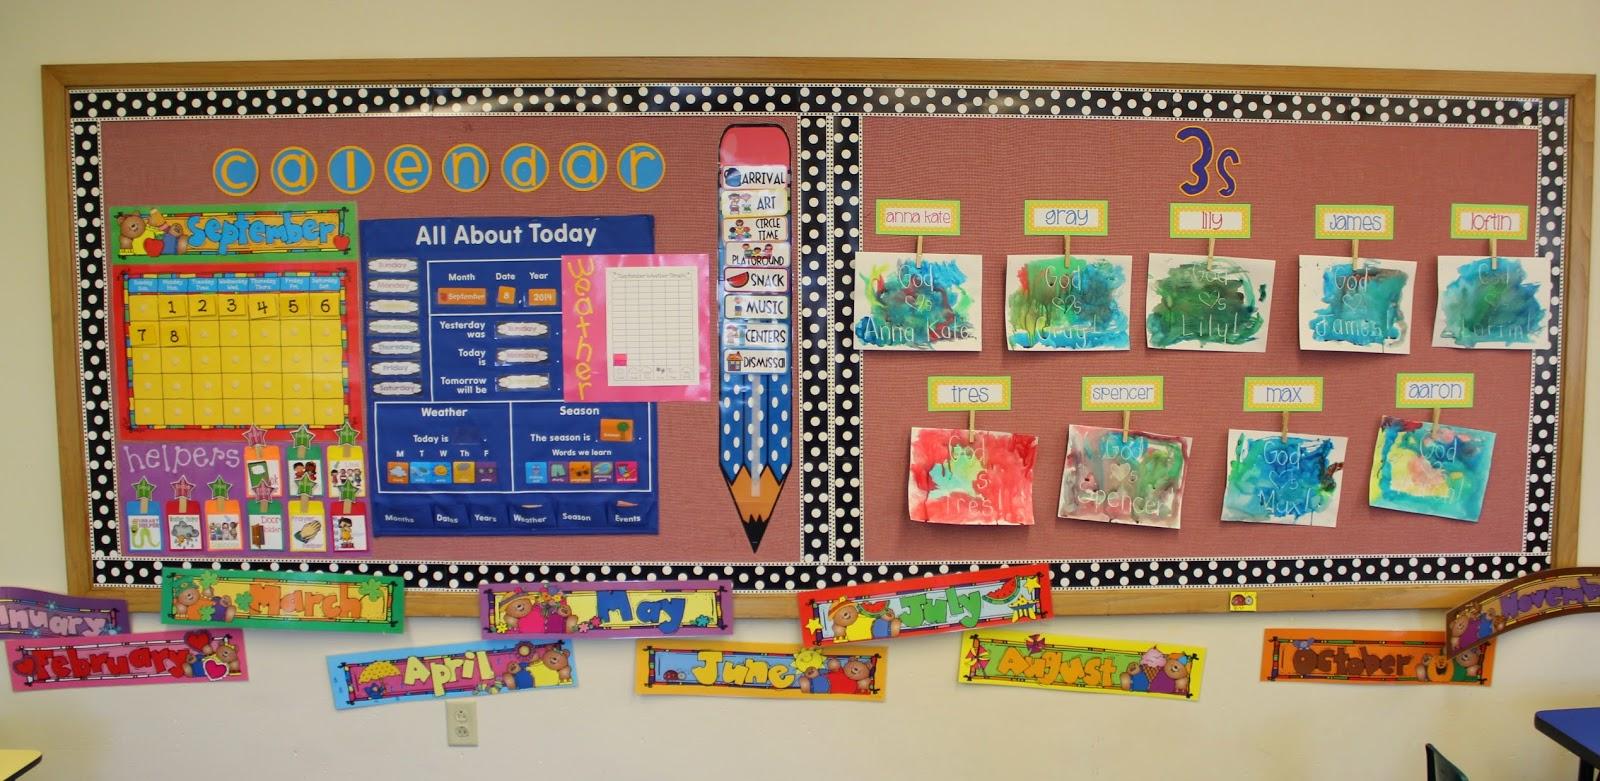 Classroom Calendar Days Of The Year : Elementary organization a classroom tour